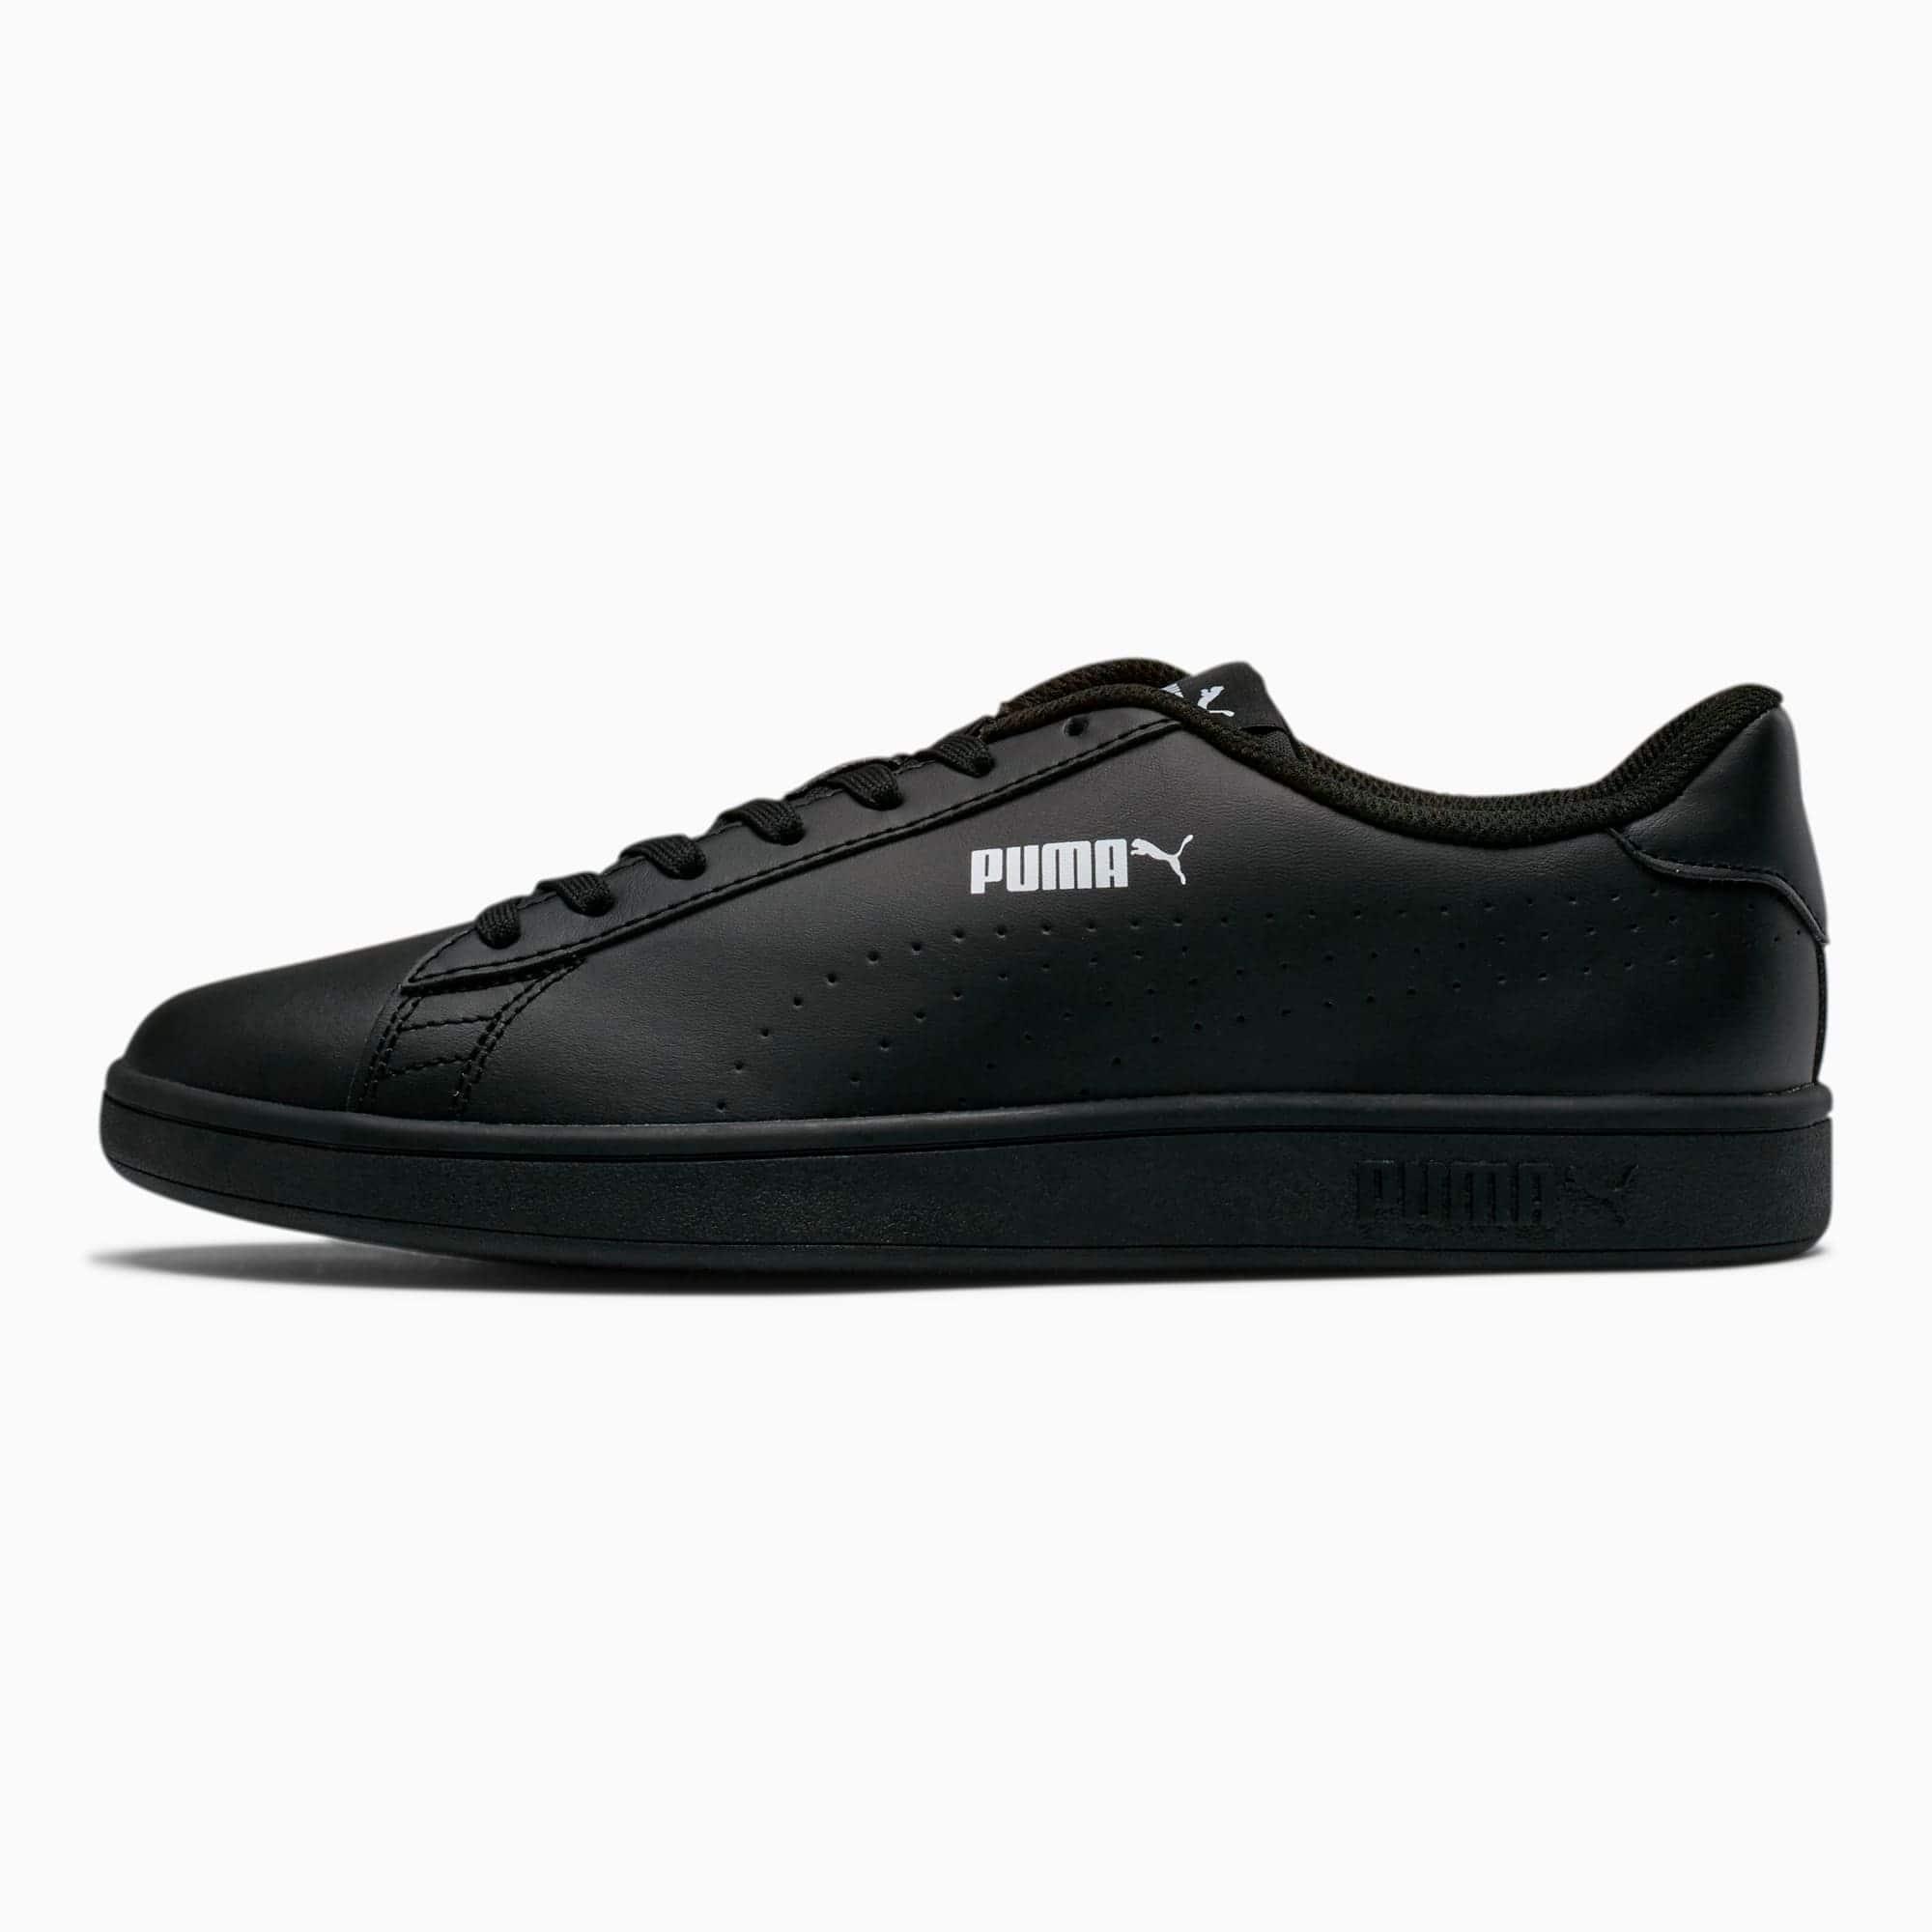 PUMA: Procat Scoreline Carrysack $7, Smash v2 Leather Perf Sneakers